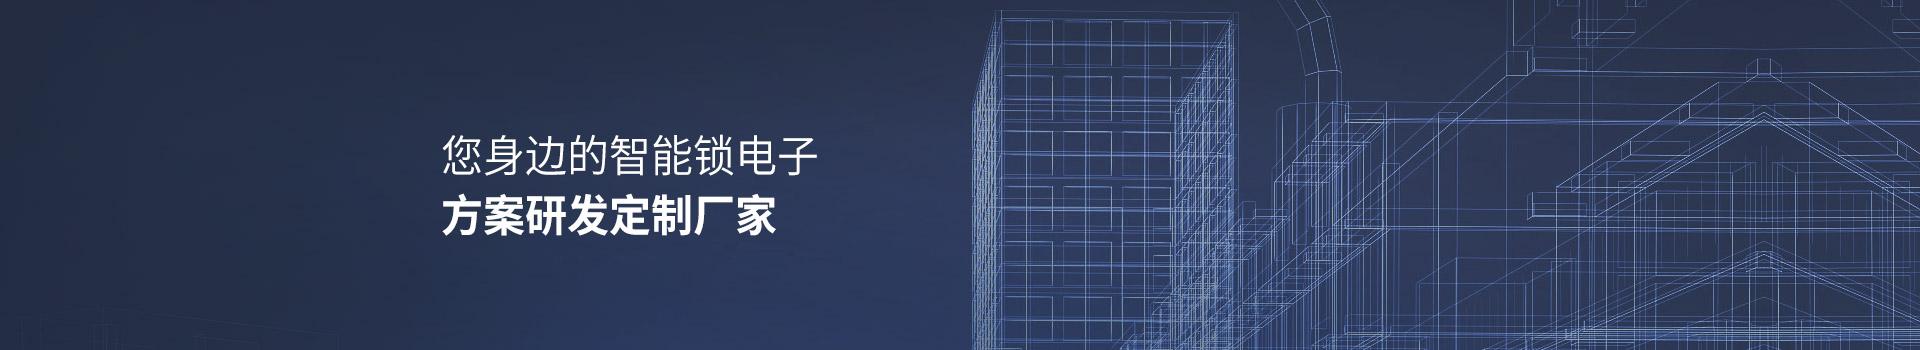 LECHT乐奇-您身边的智能锁电子方案研发定制厂家